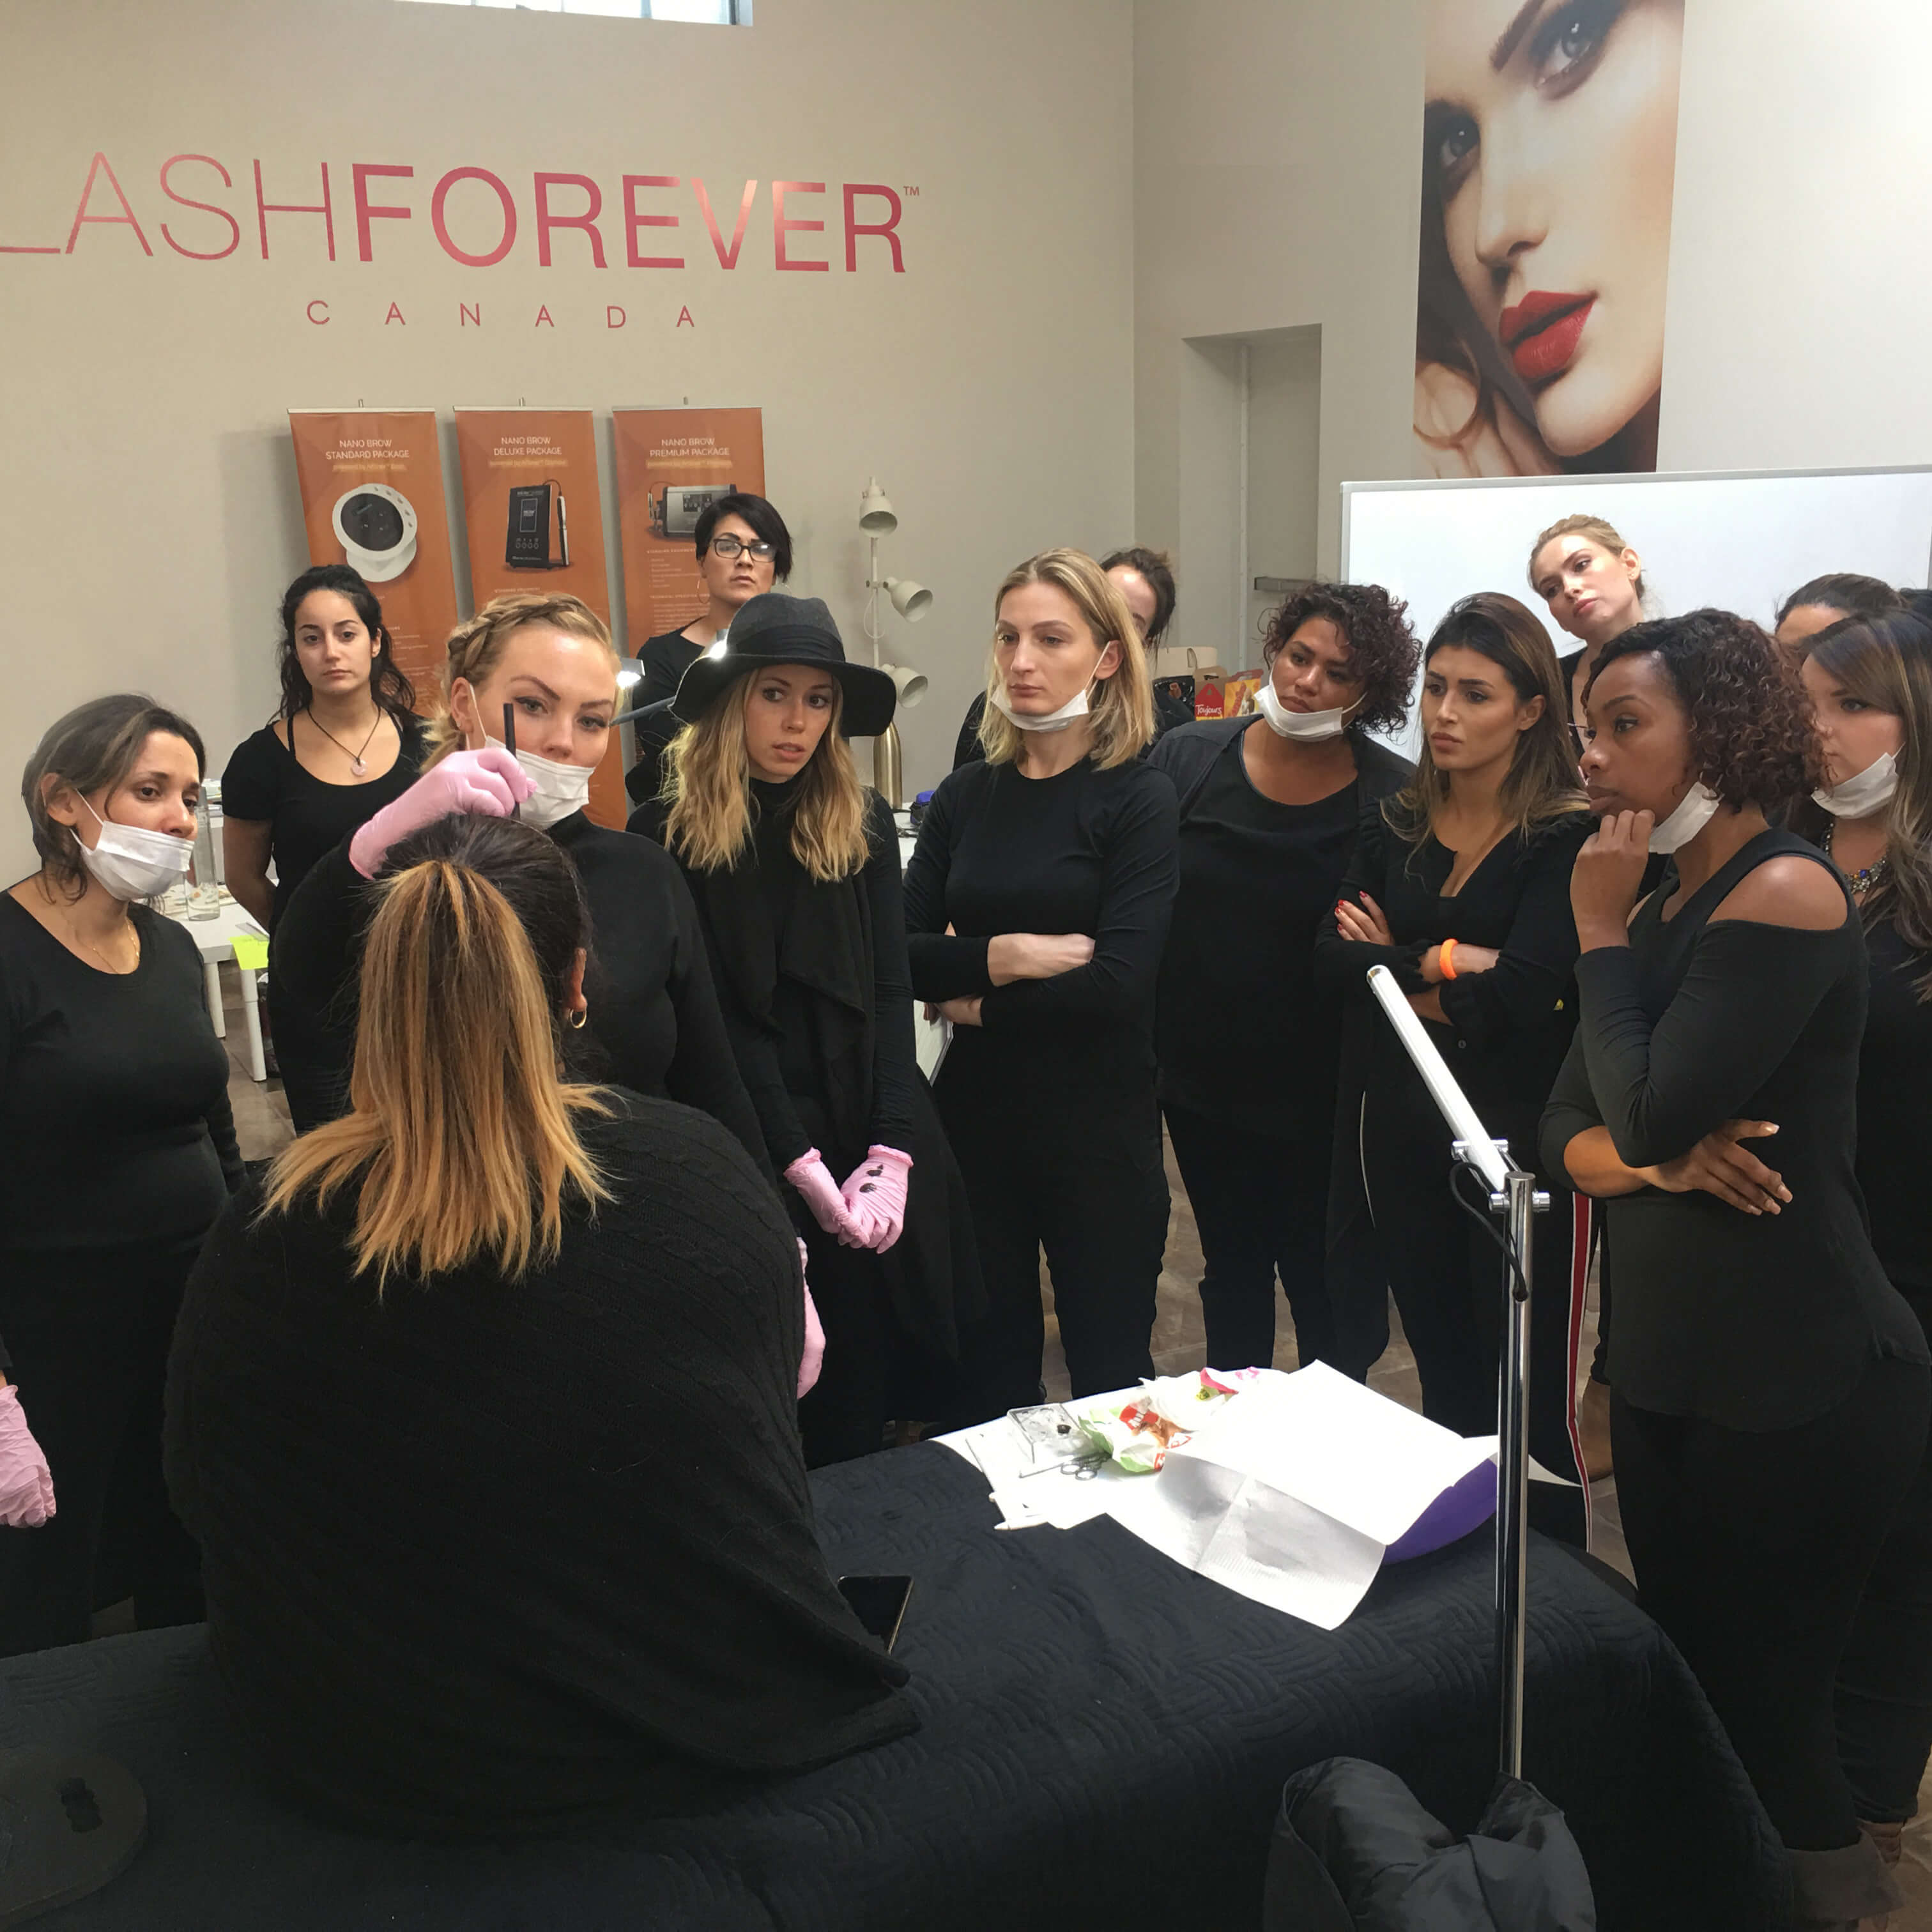 Lashforever - Eyelash & Eyebrow Training in Canada